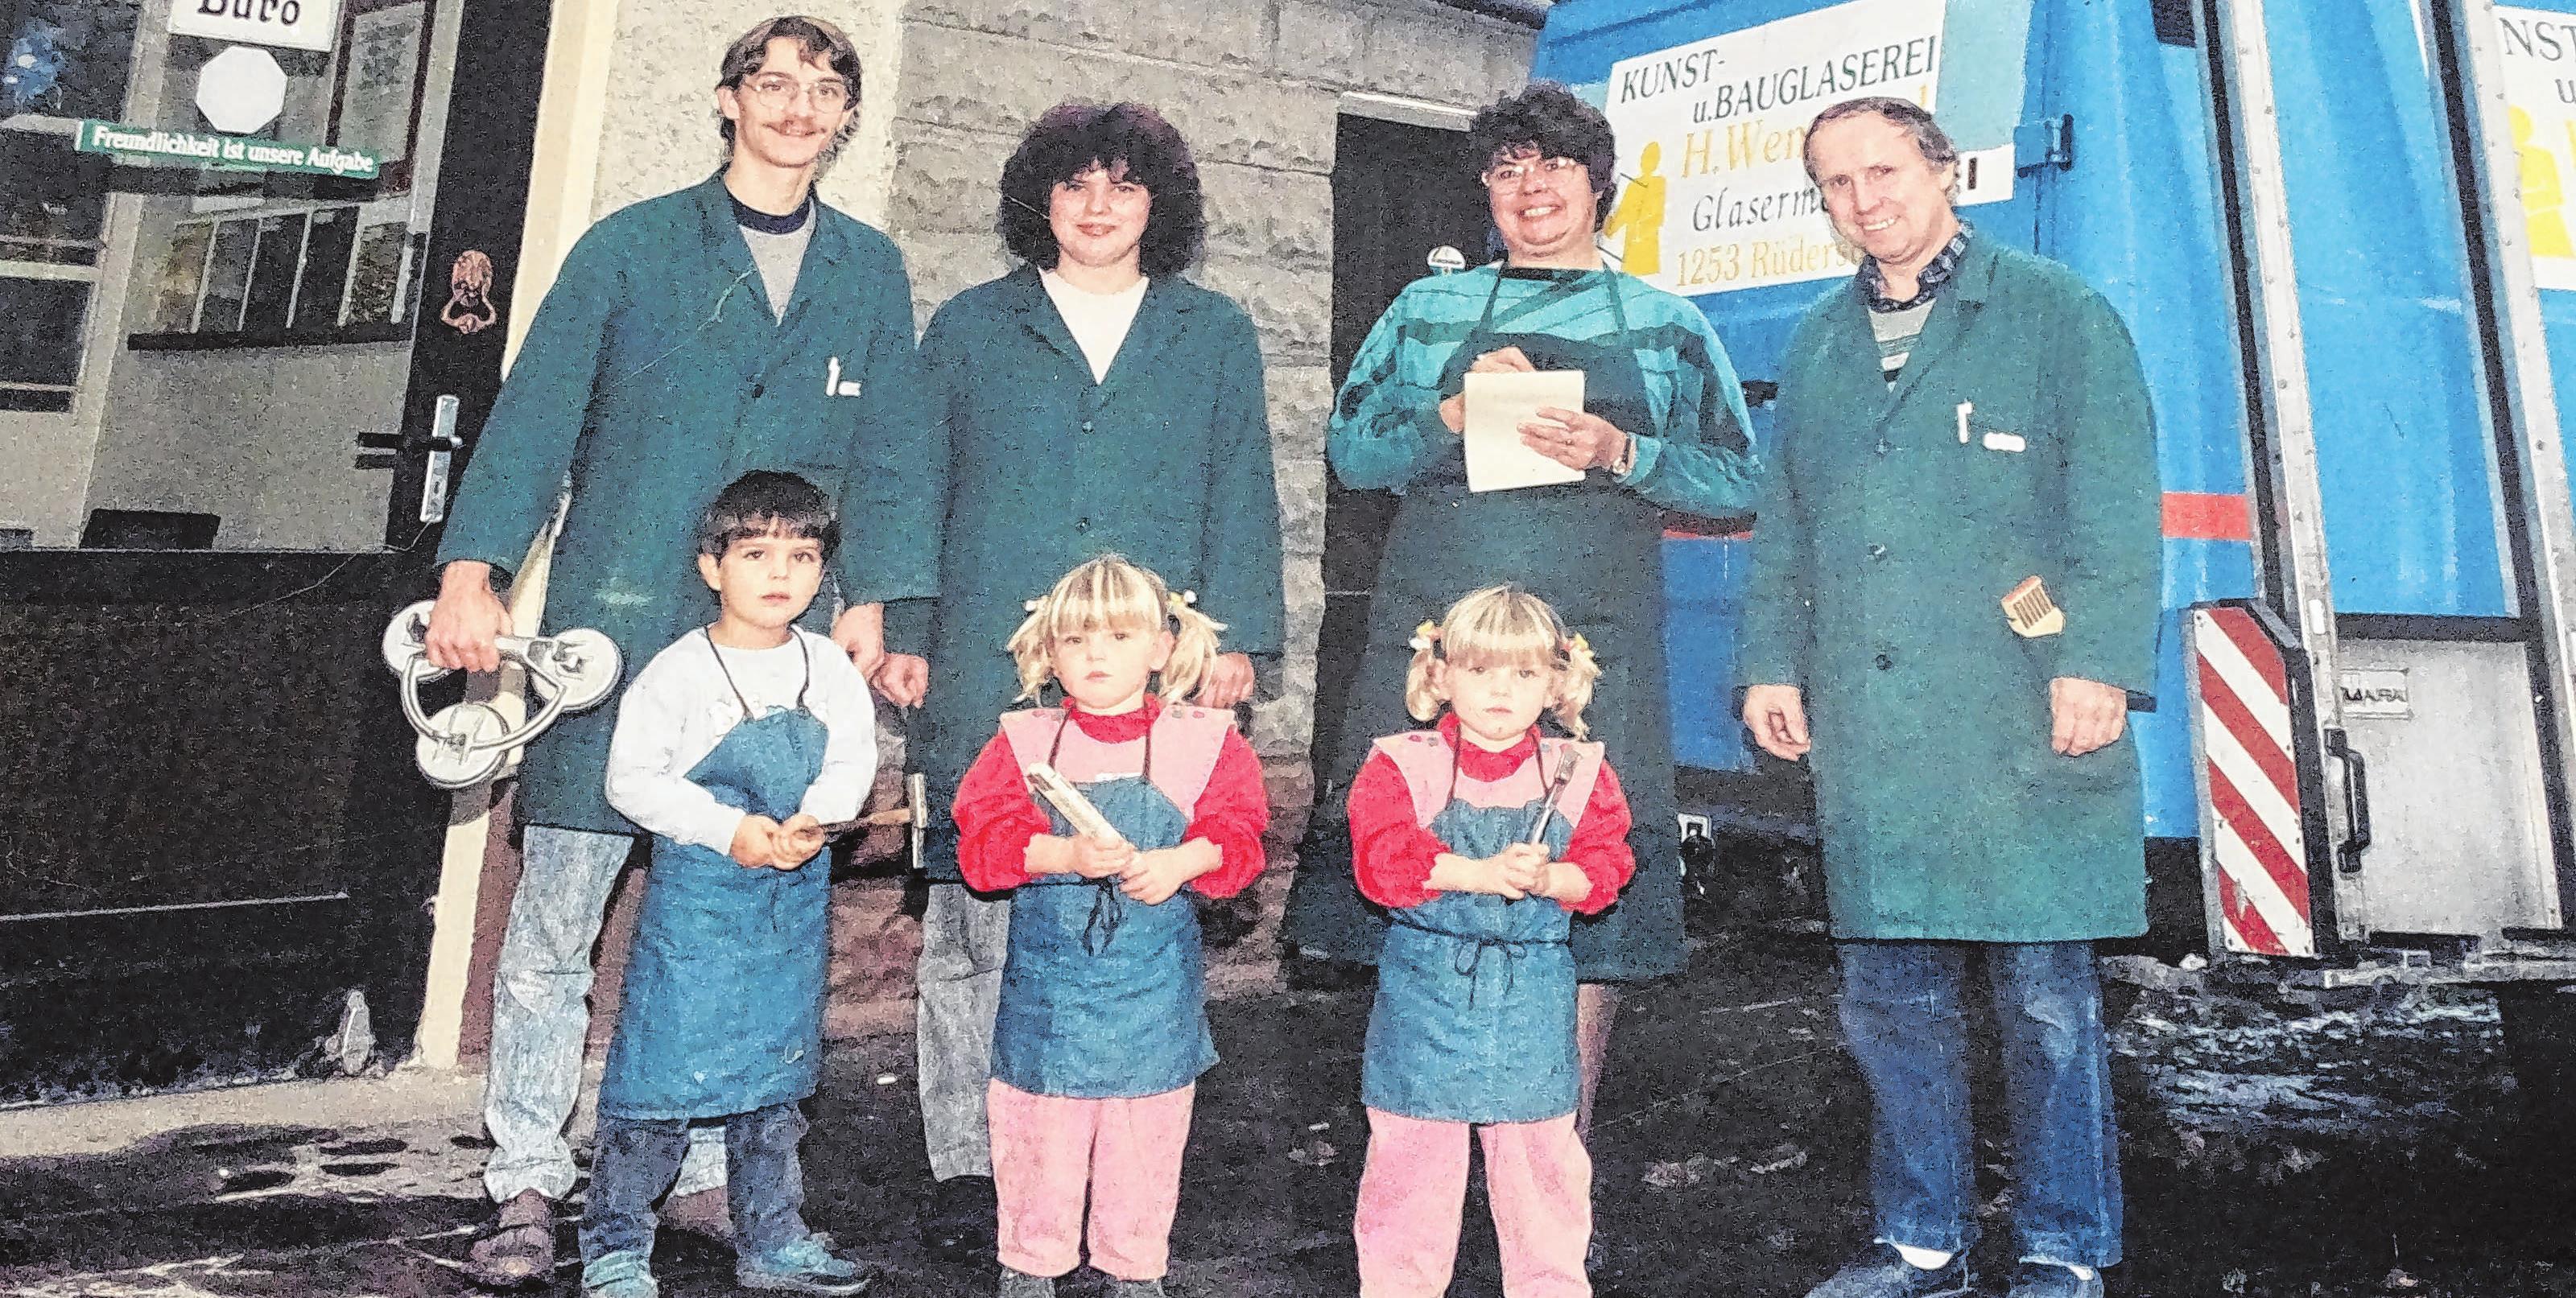 Die Familie Wendland/ Stepke: (hinten von links) Wolfgang Stepke, Antje Stepke, Sibille Wendland, Horst Wendland, (vorne von links) Marko Stepke, Anja Stepke, Susann Stepke Foto: privat